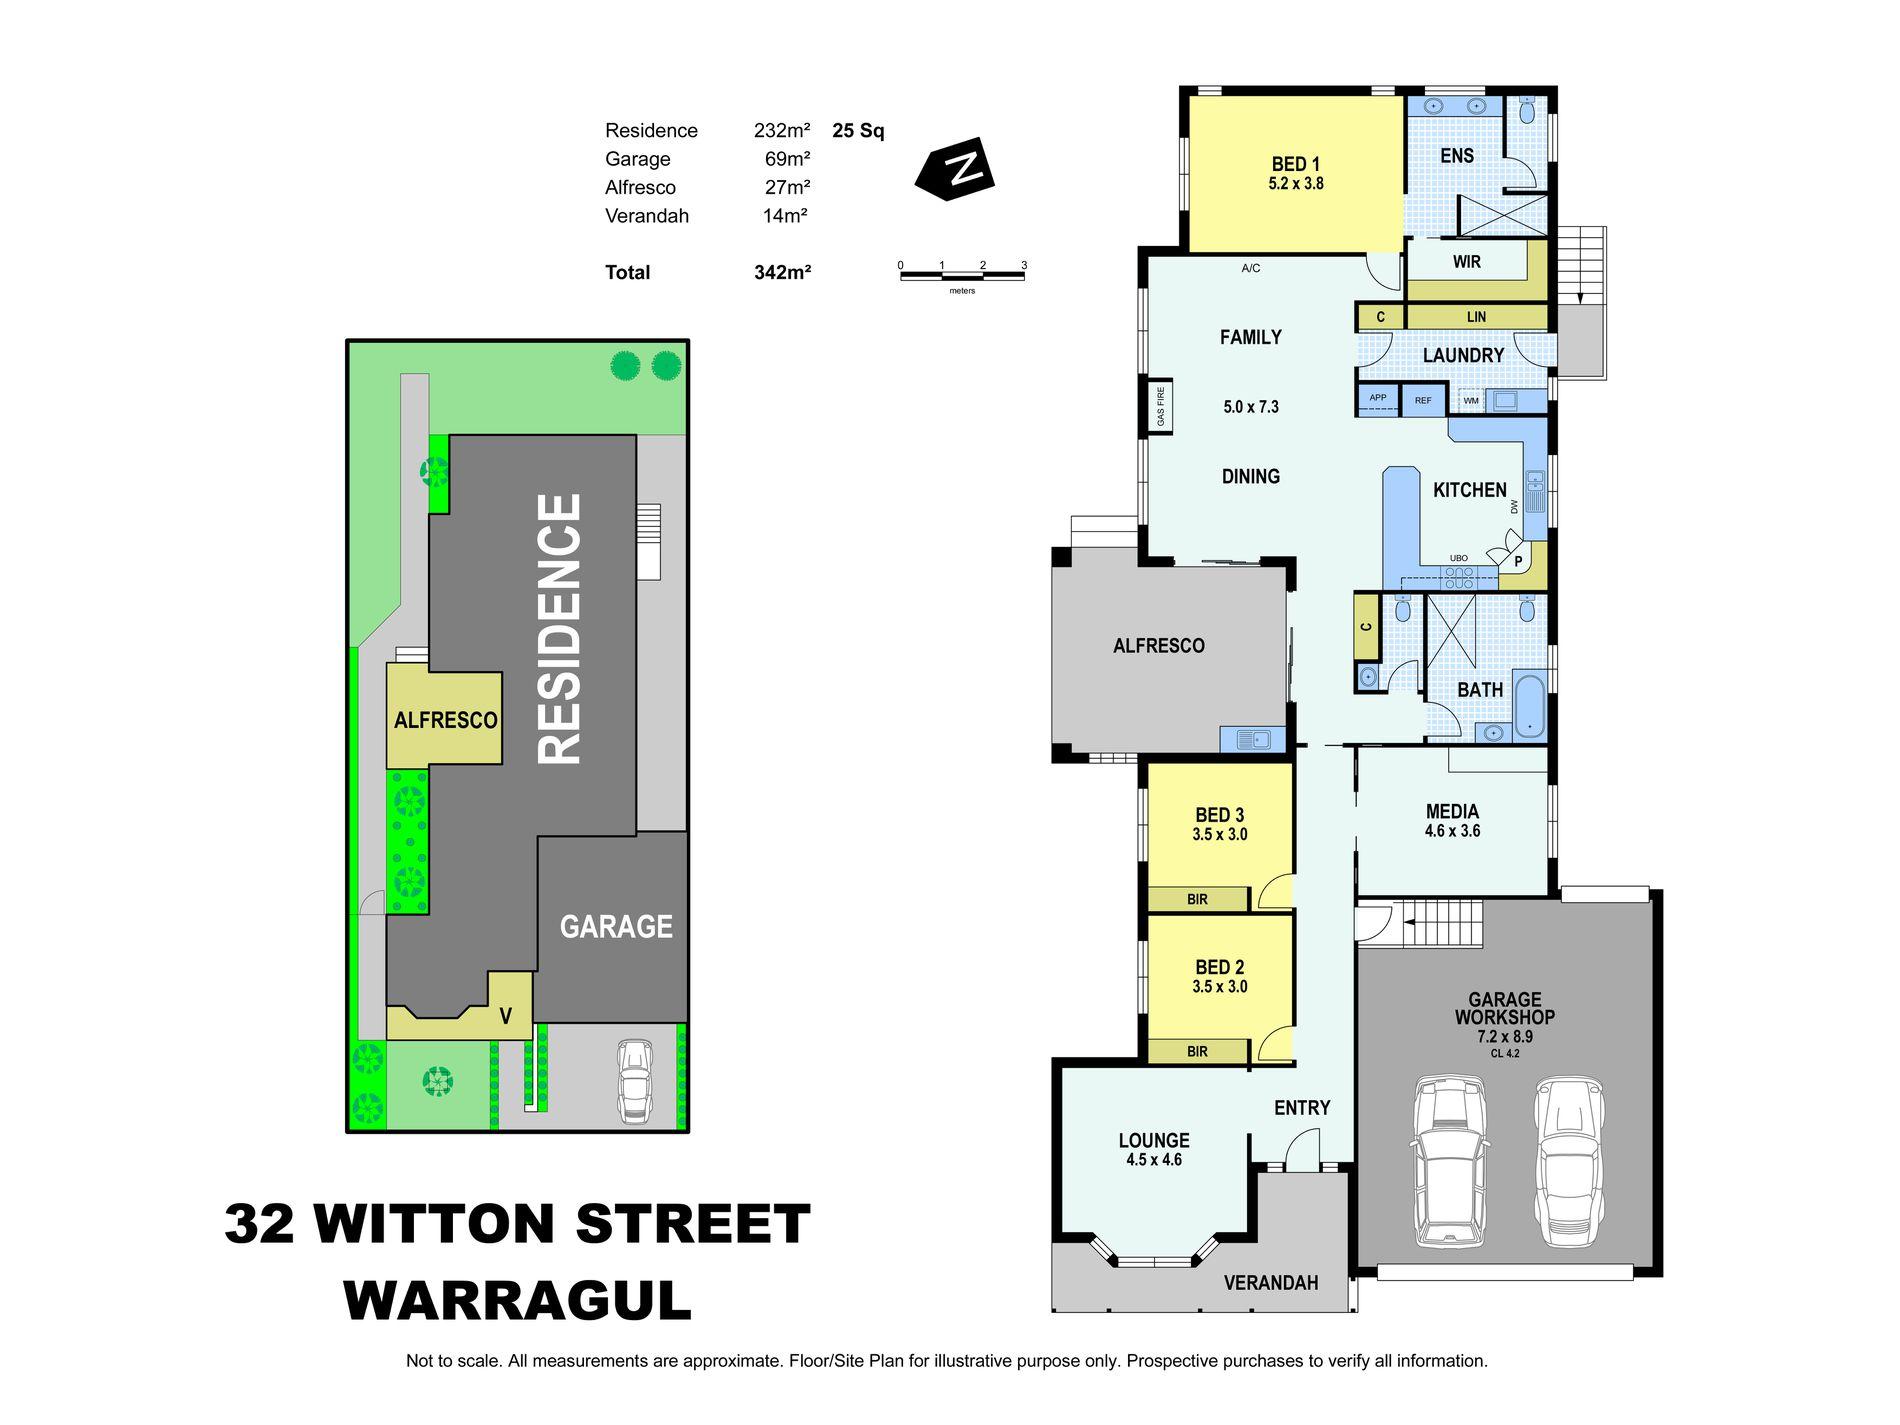 32 Witton Street, Warragul